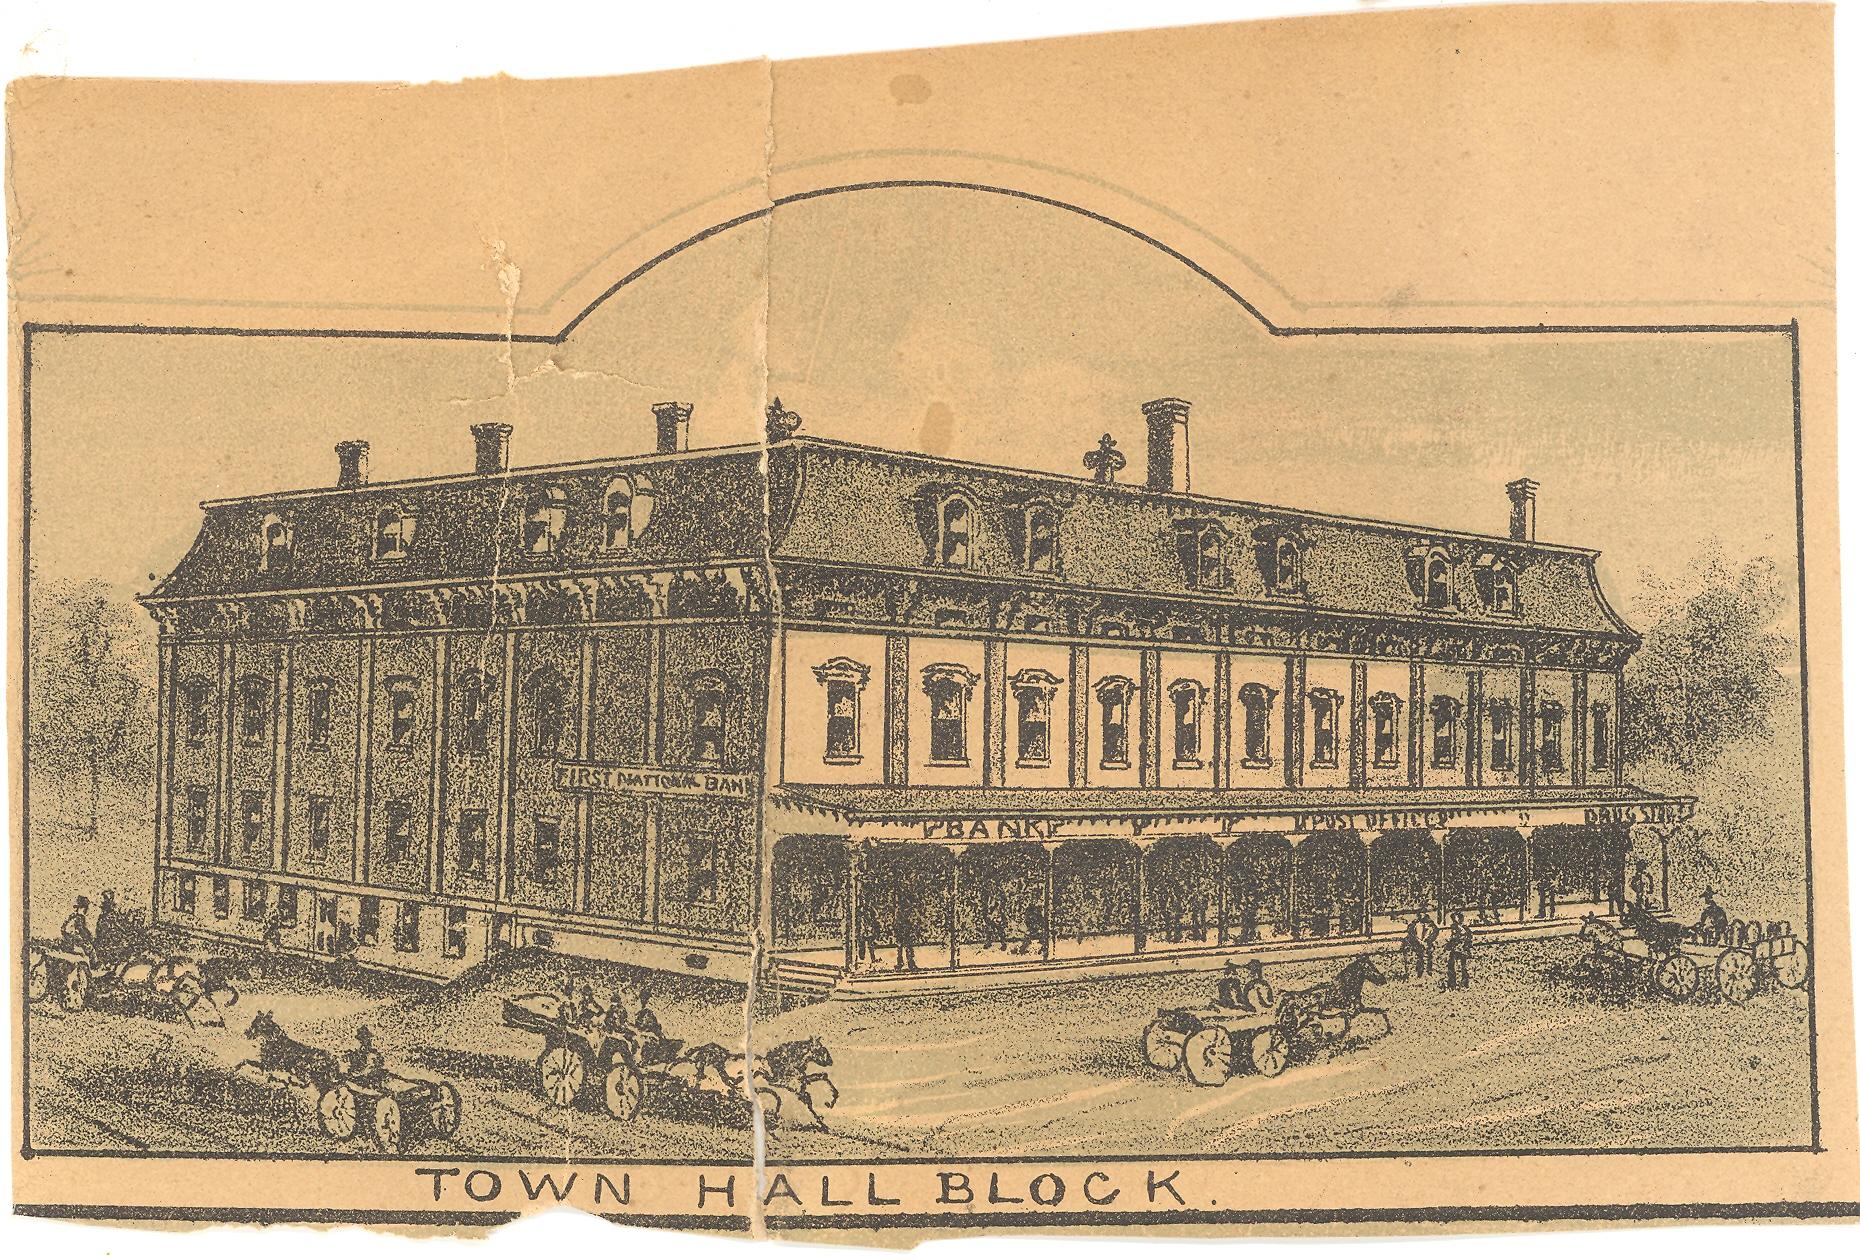 Town_Hall_Block_1887.jpg